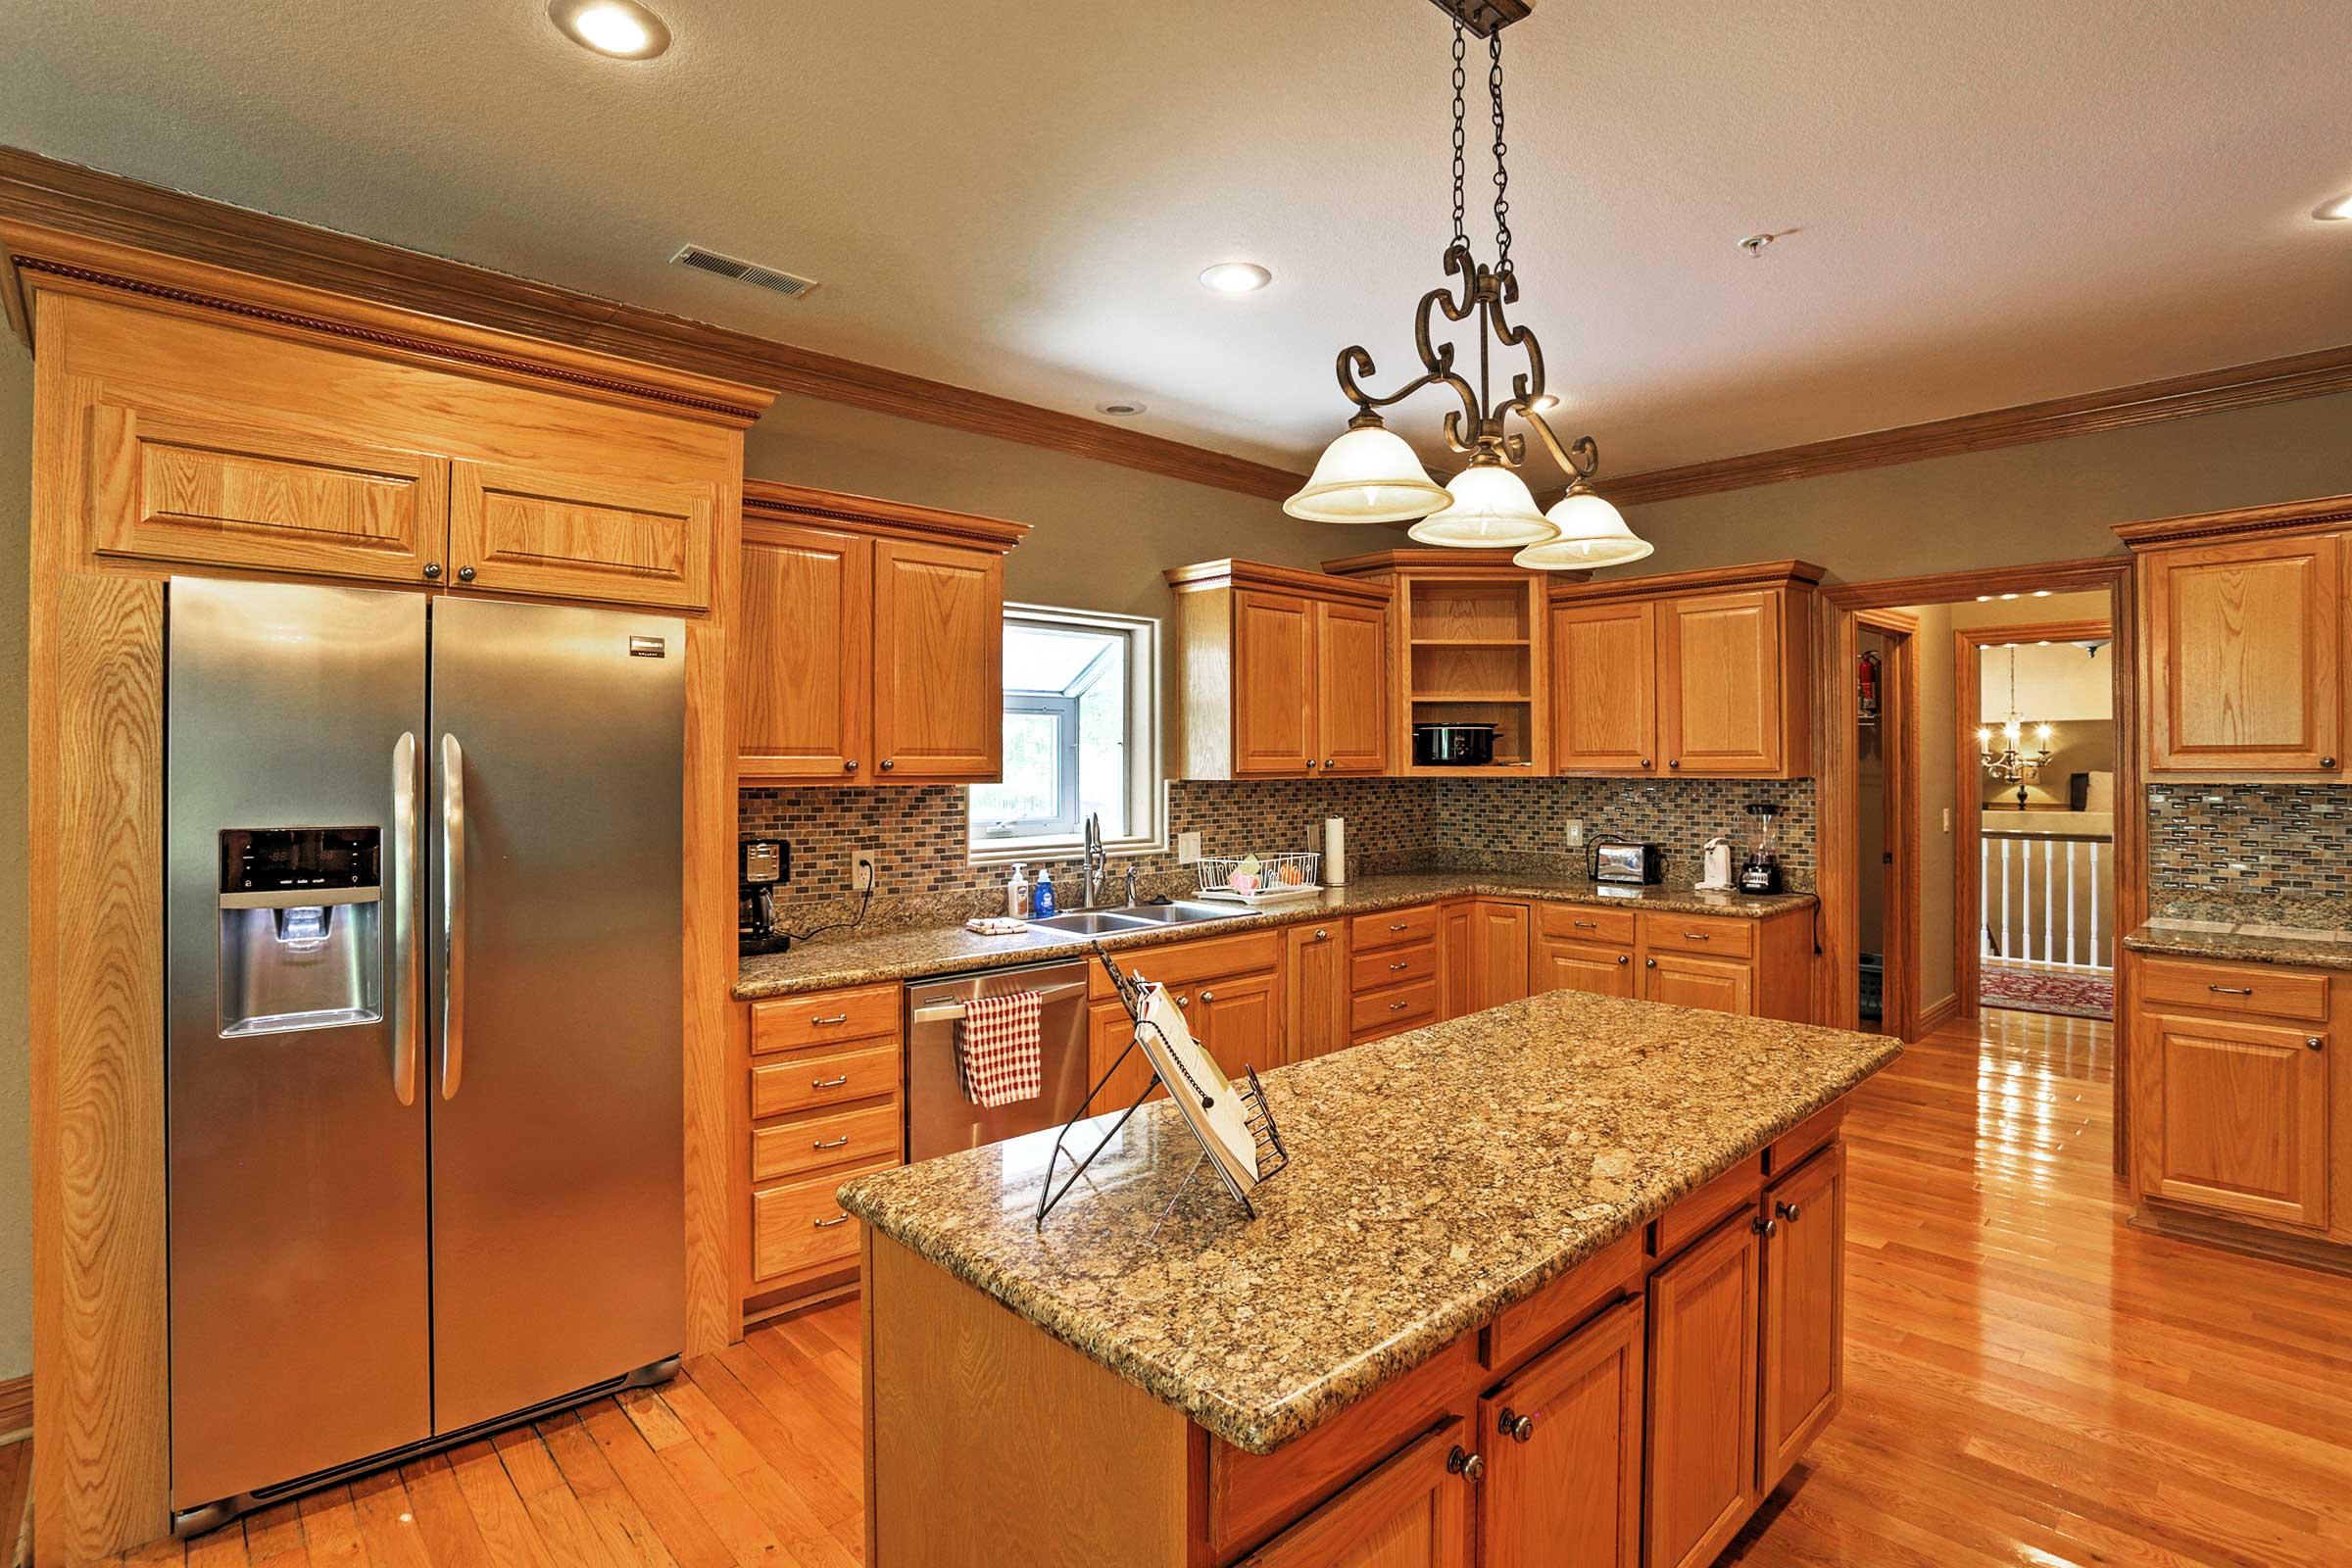 Fully Equipped Kitchen | Crock-Pot | Blender | Toaster